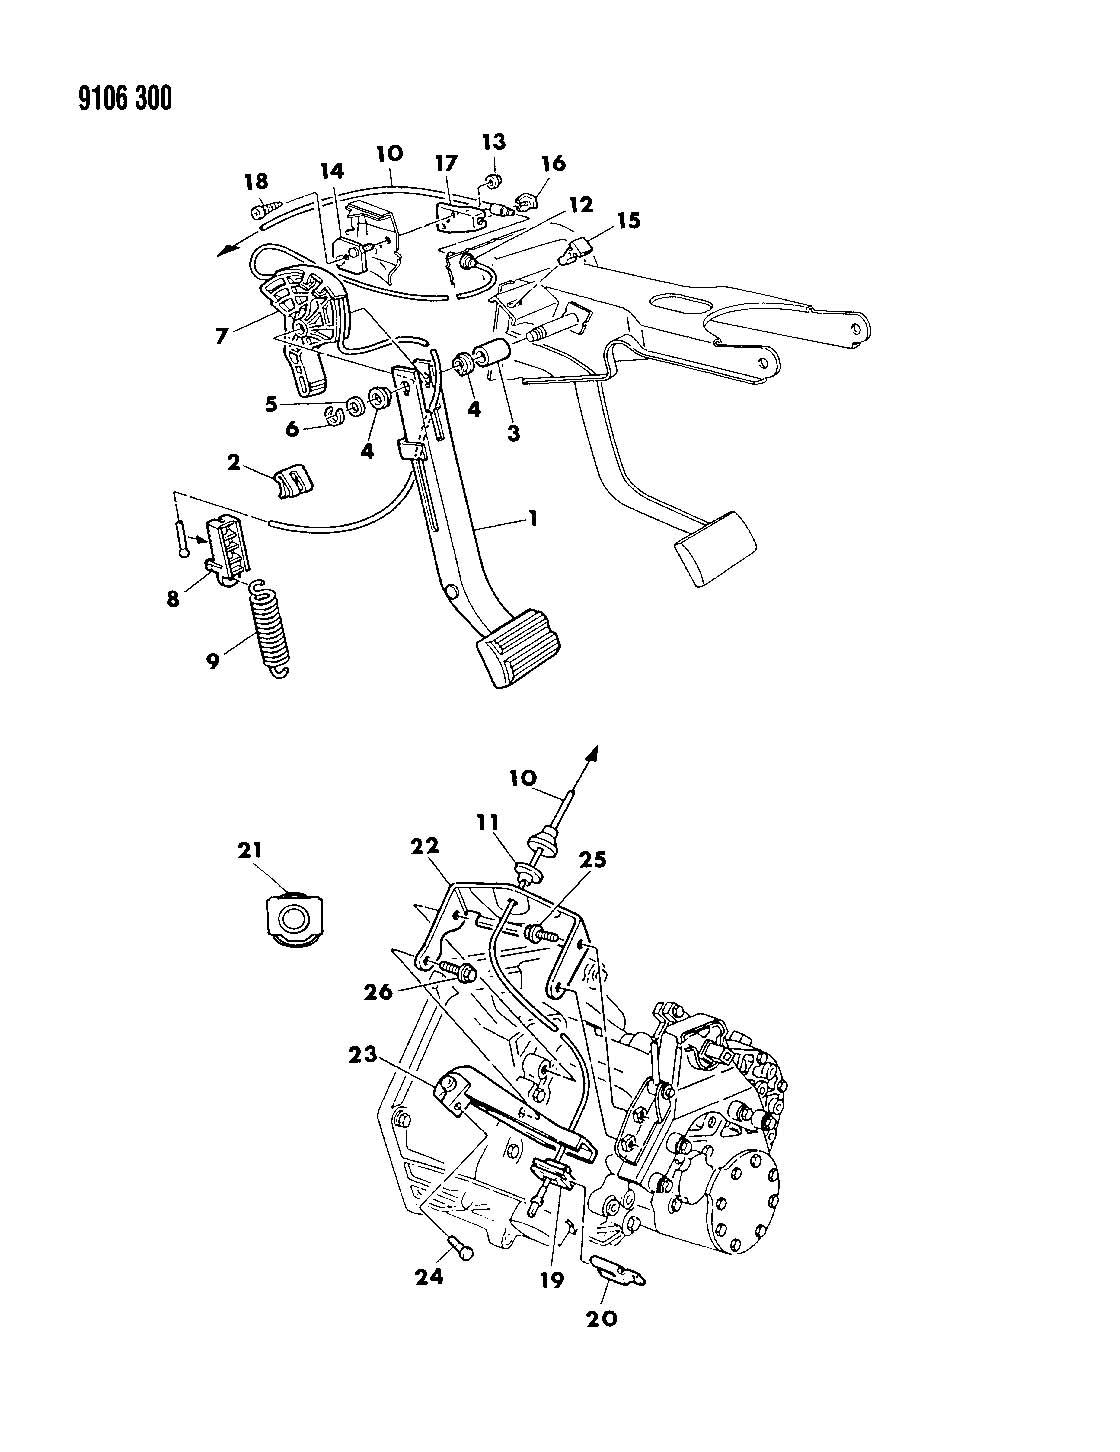 Chrysler Clutch Pedal And Linkage 2 2l 16 Valve Eng Getrag 5 Speed Q Body